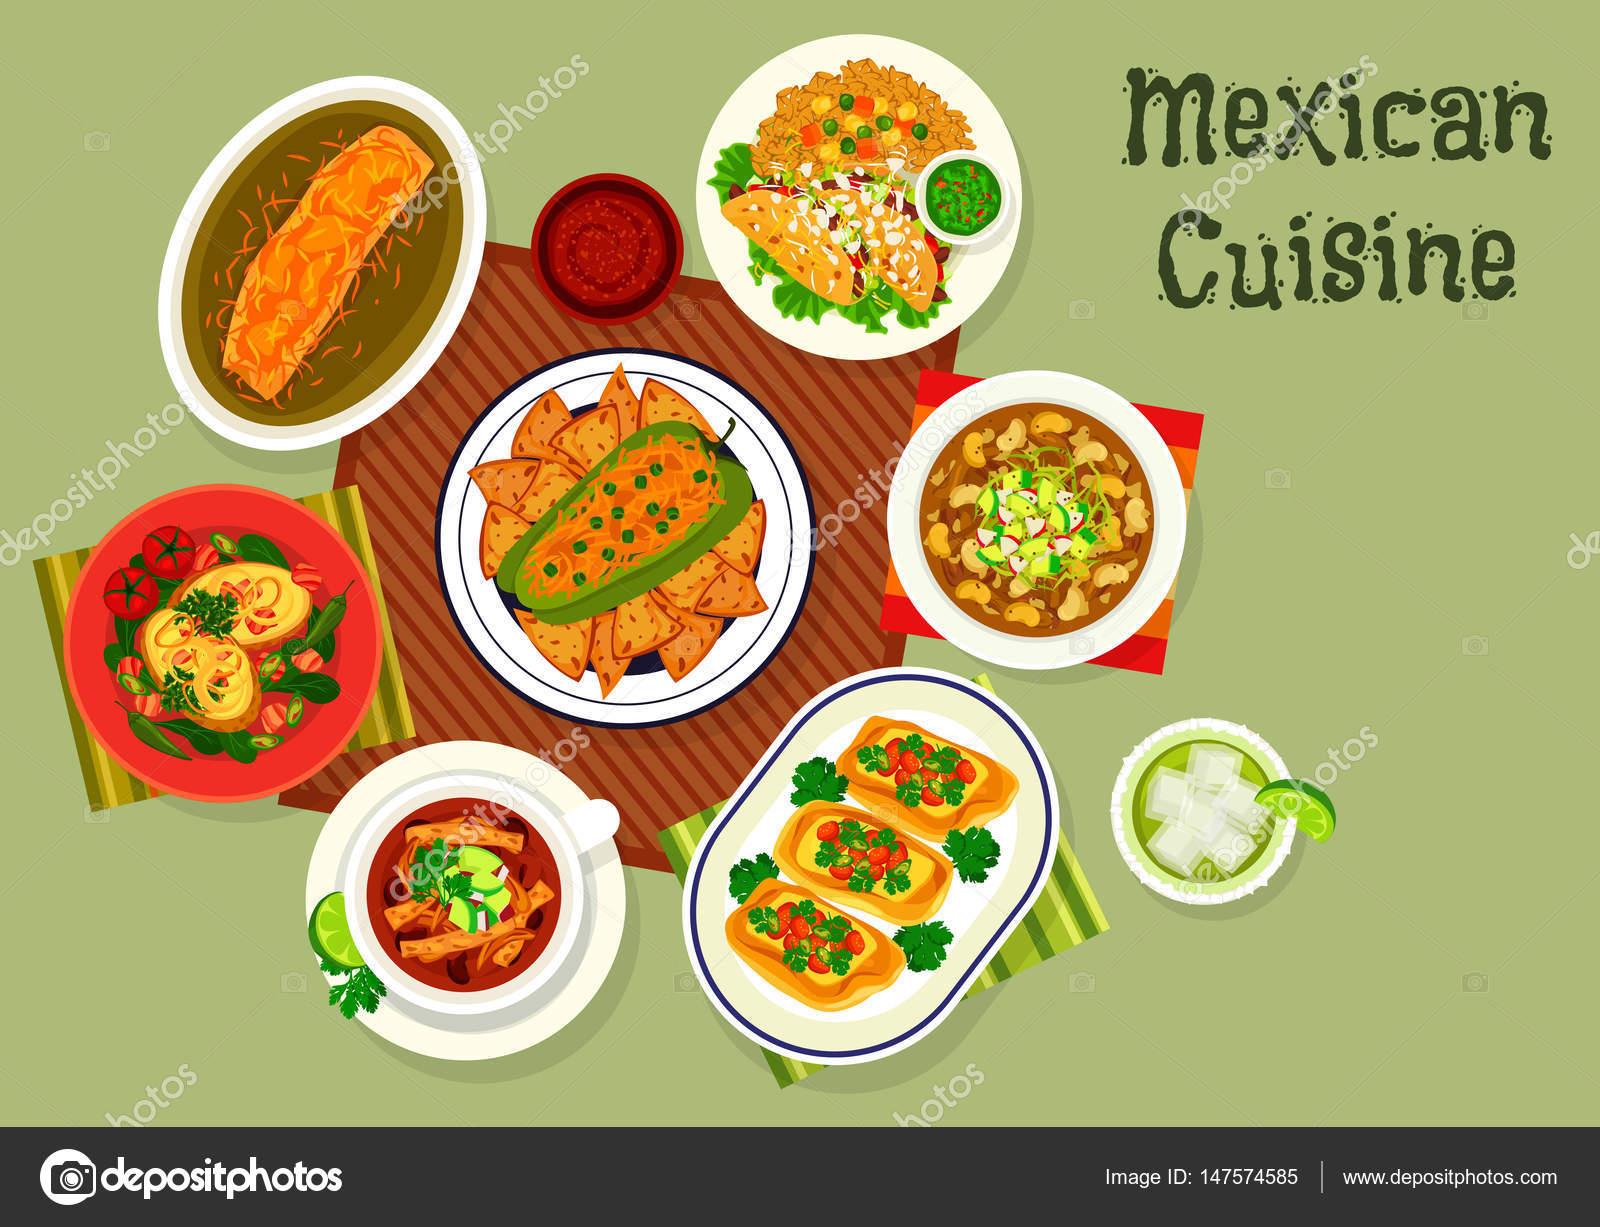 Kuchnia Meksykanska Ikona Z Zupy I Kanapki Grafika Wektorowa